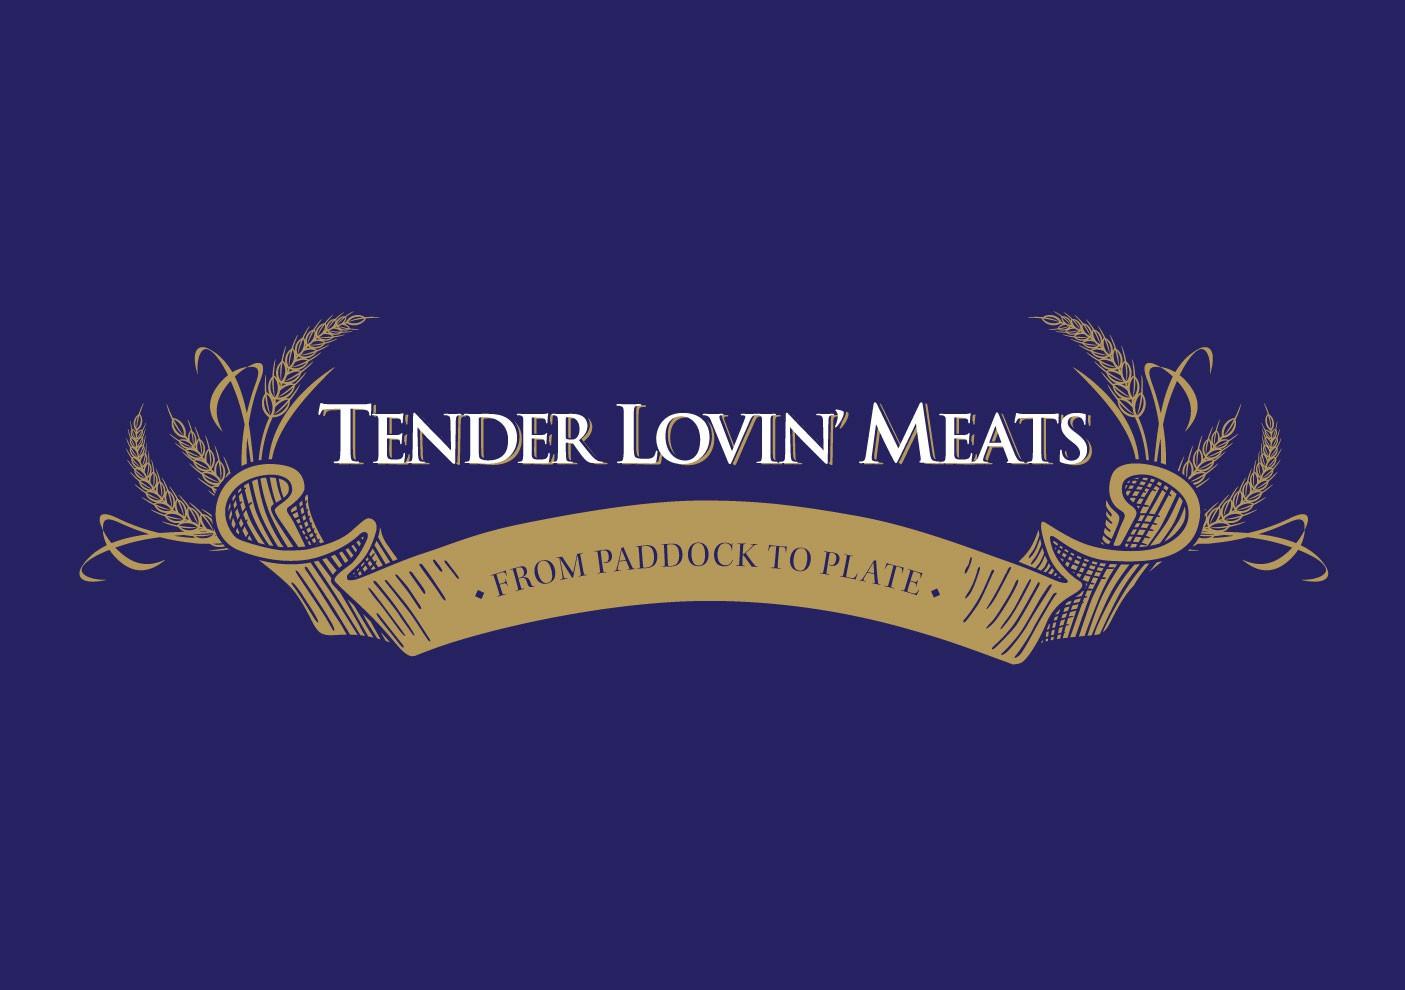 Create the next logo for Tender Lovin' Meats